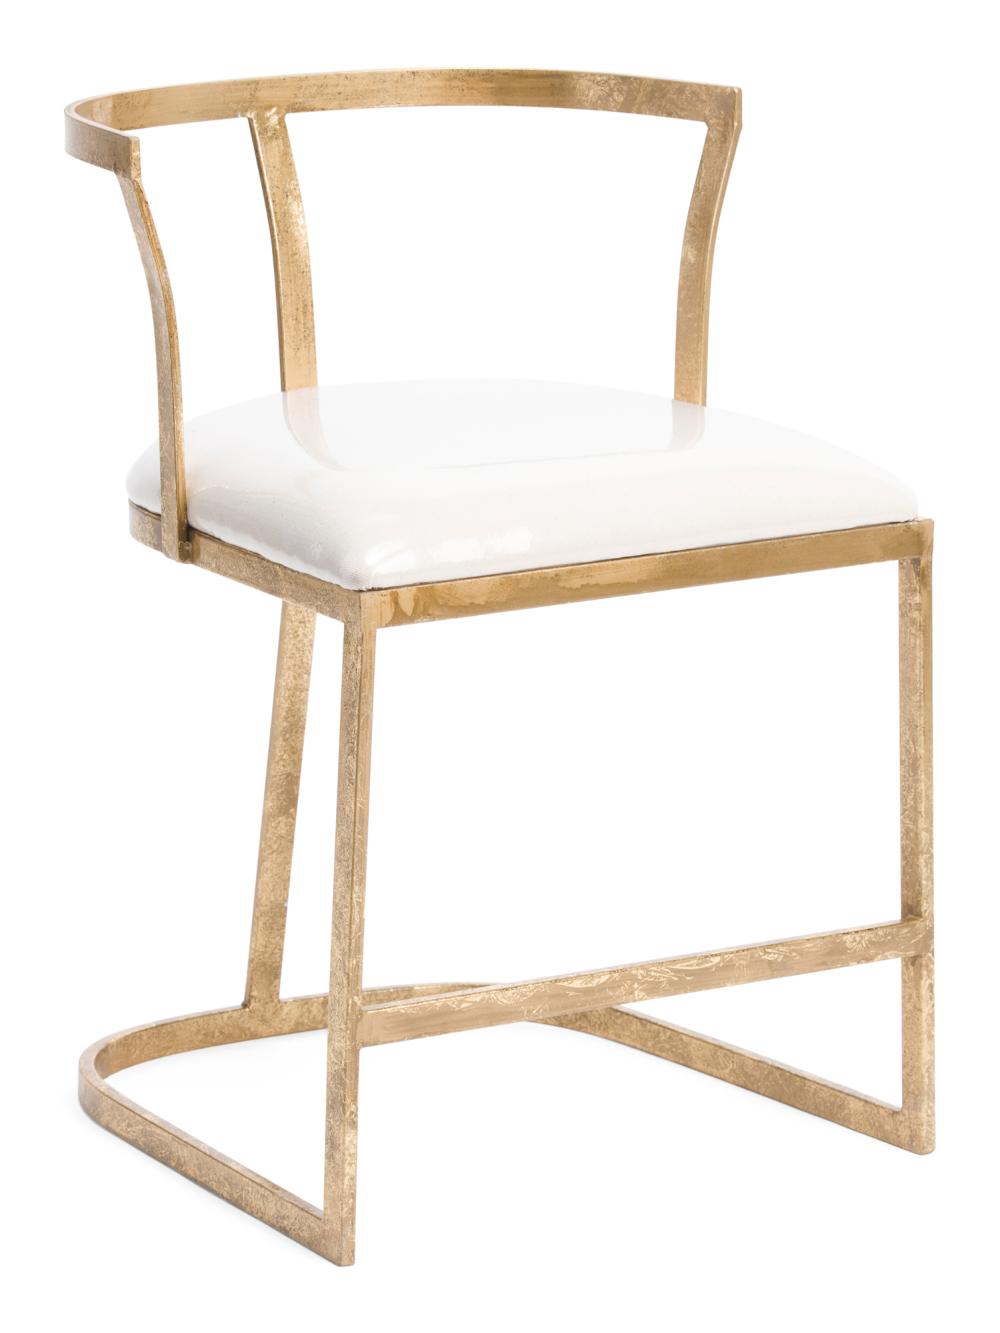 Glam Wishbone Chair Accent & Vanity Stools T.J.Maxx